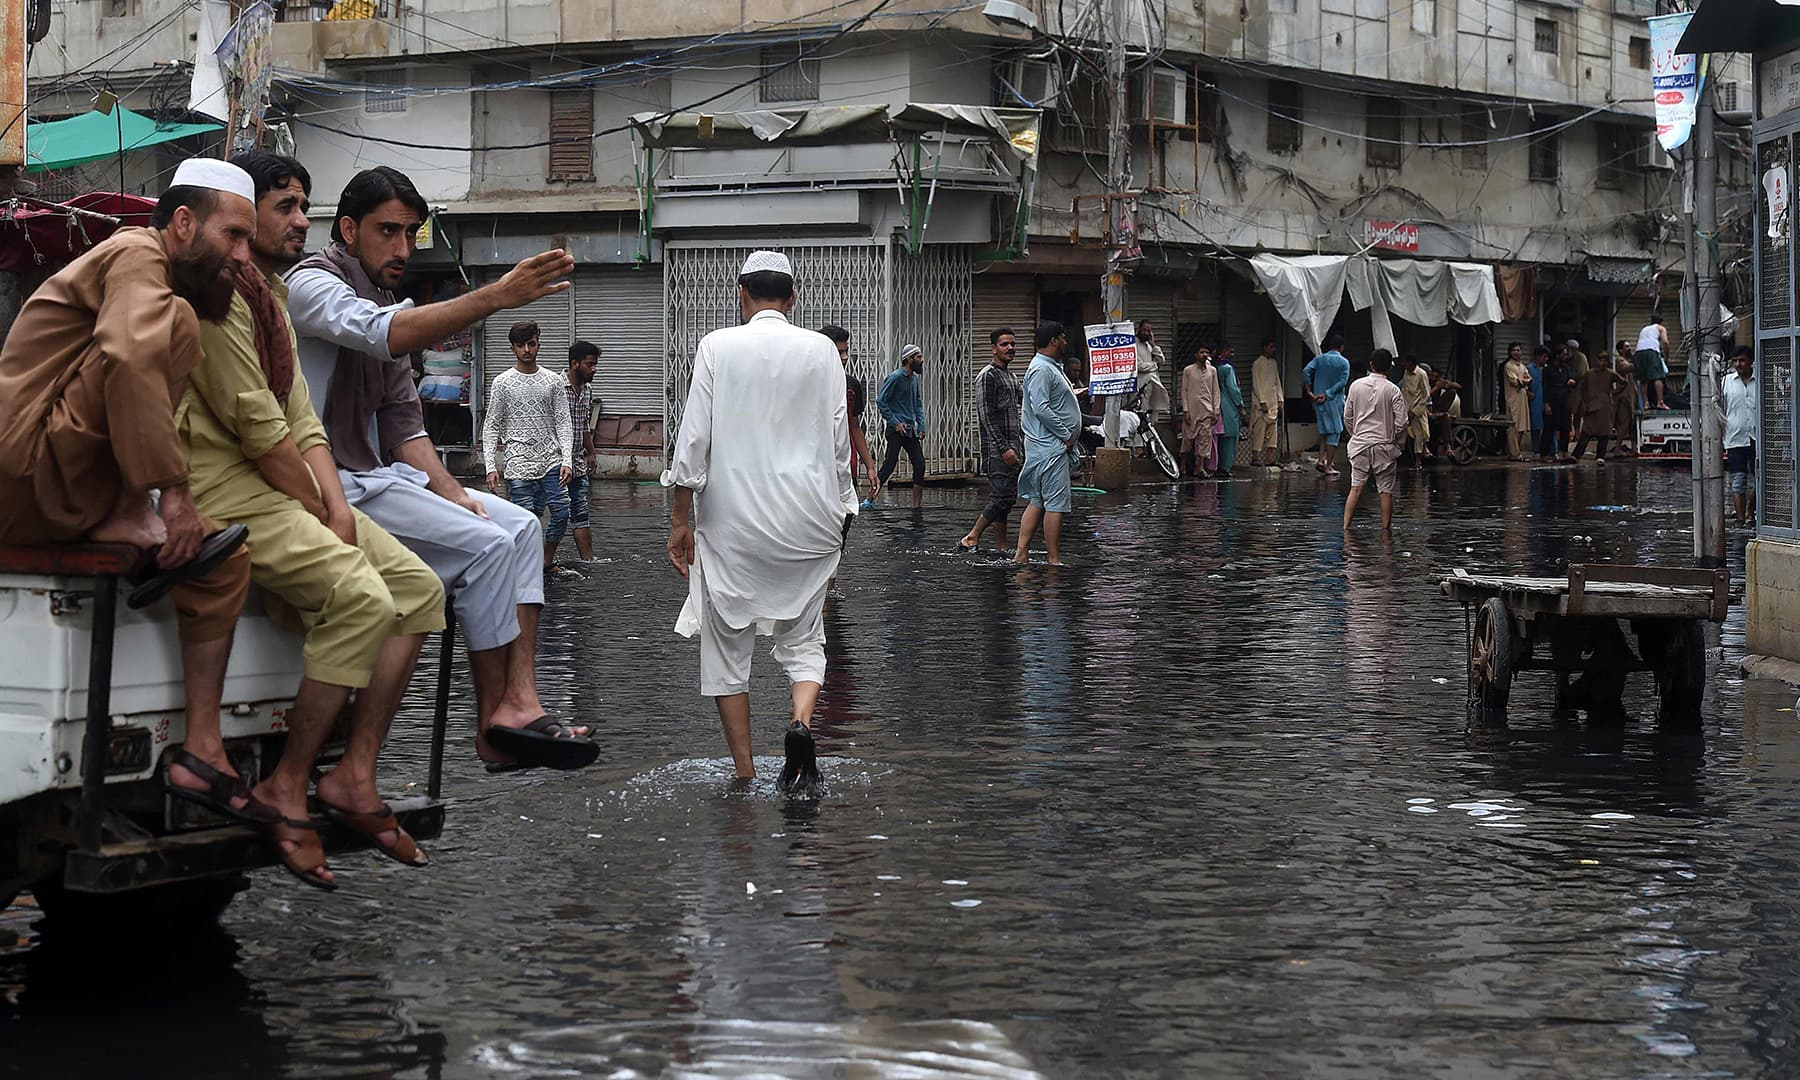 Men wade along a flooded street after heavy monsoon rains in Karachi on August 31. — AFP